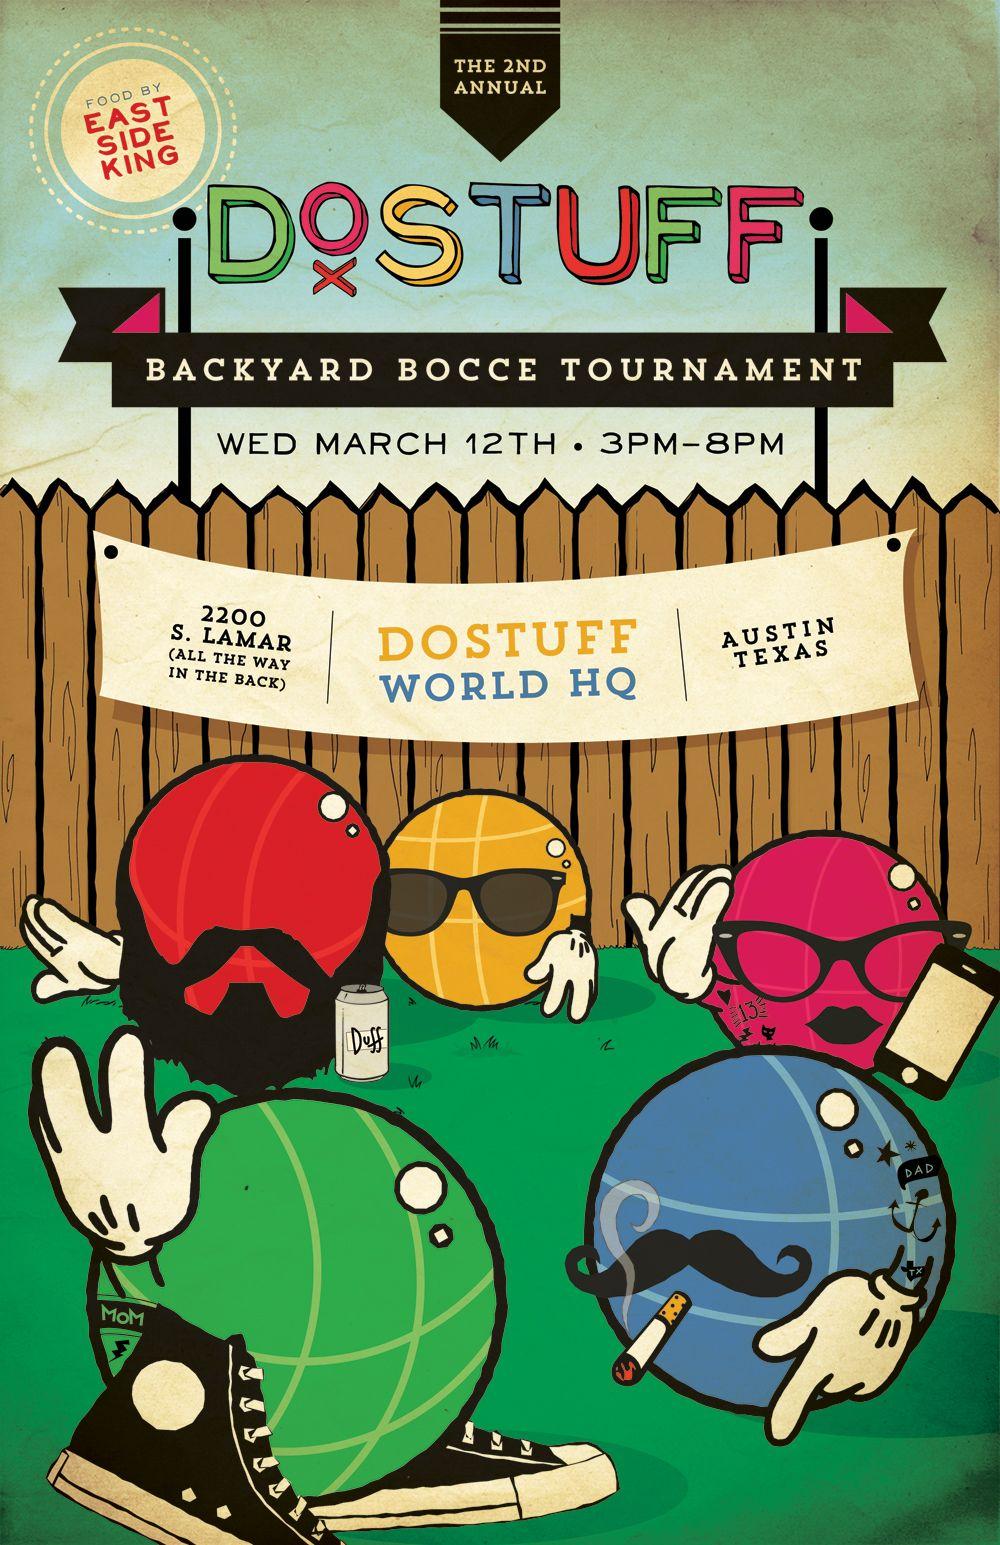 sx 2014 2nd annual backyard bocce tournament at dostuff world